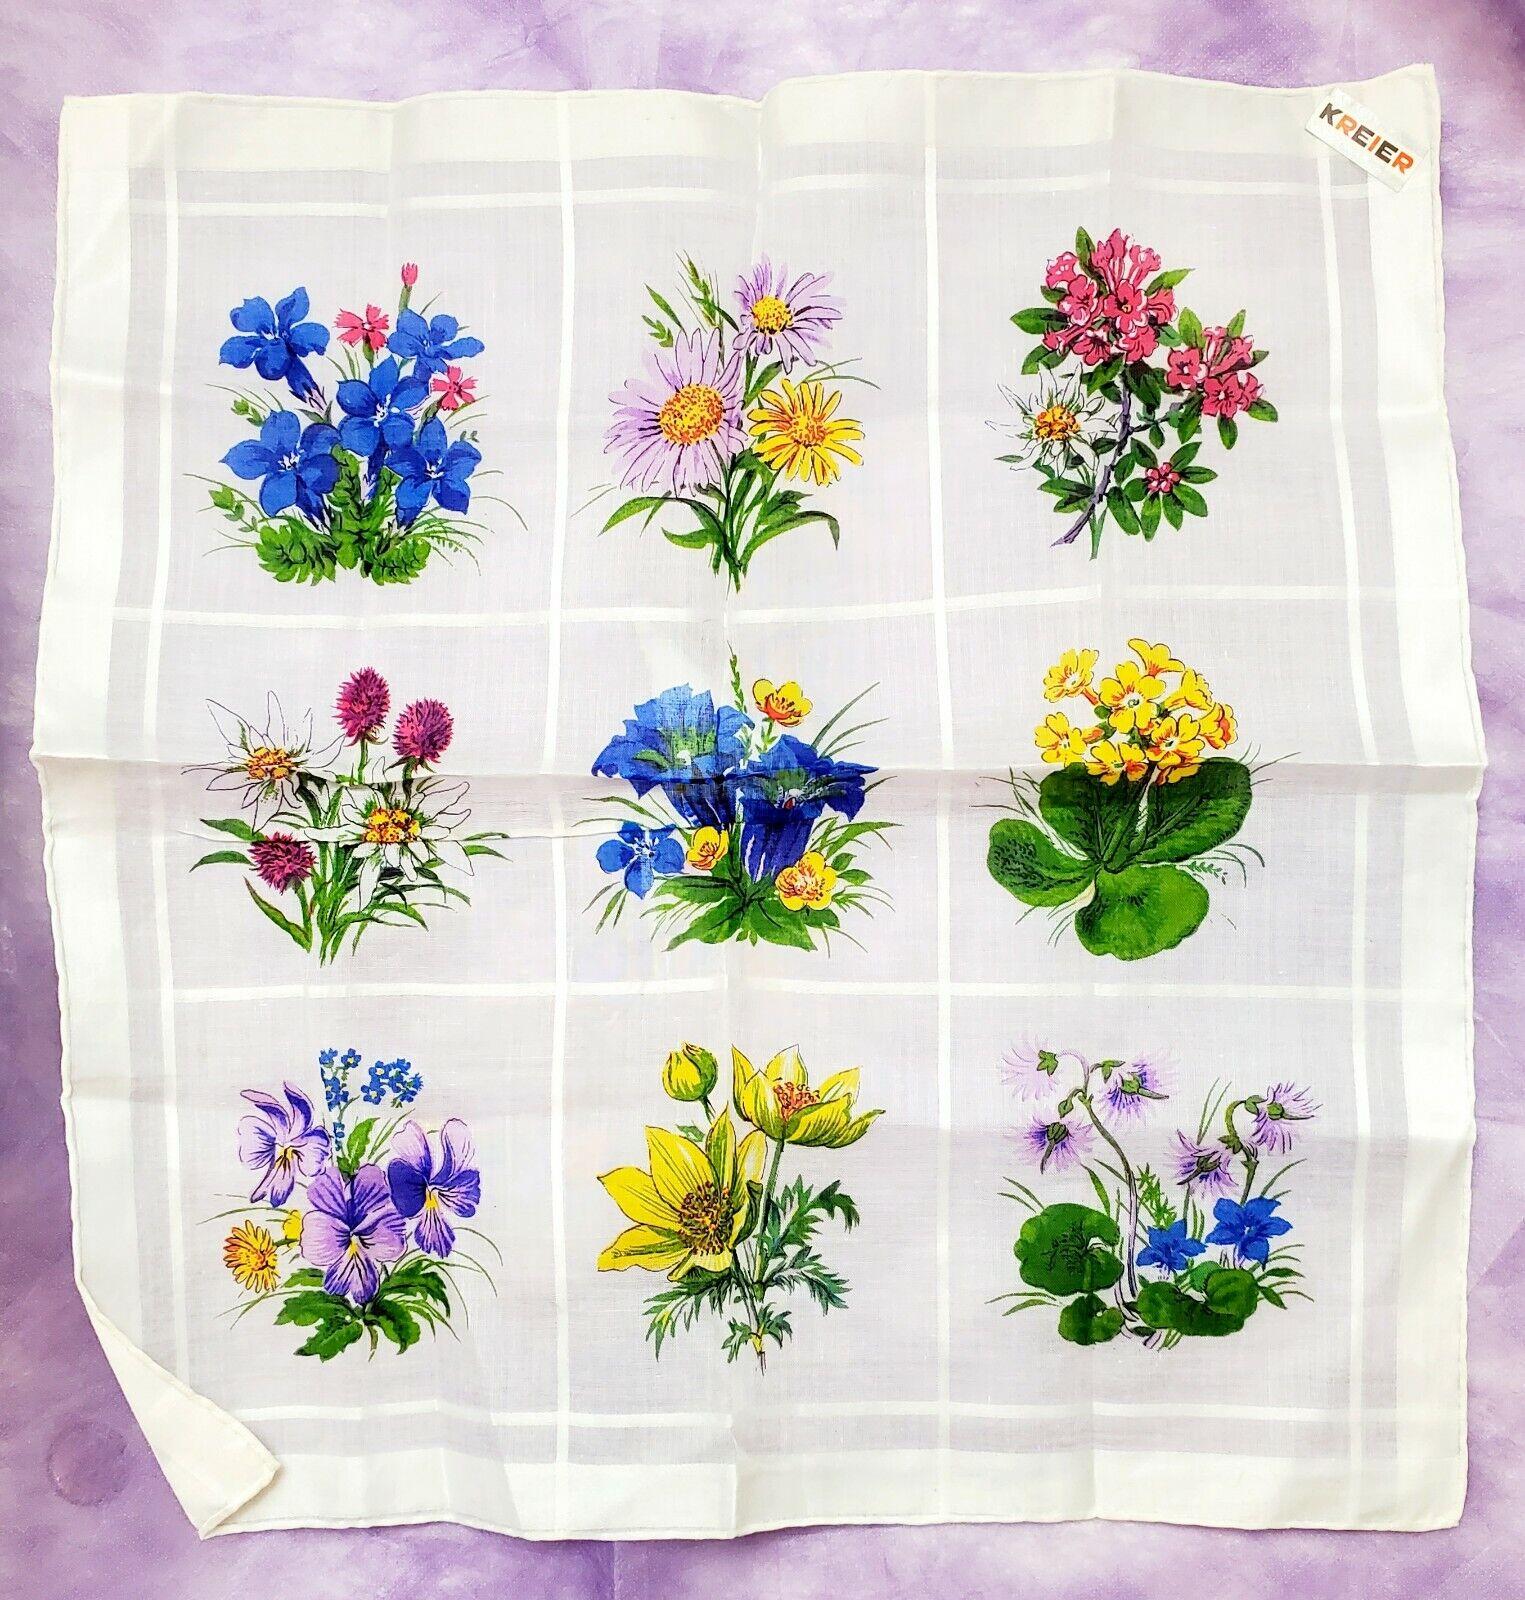 KRIER Lot Of 2 VINTAGE Handkerchiefs Colorful Flowers On White 13